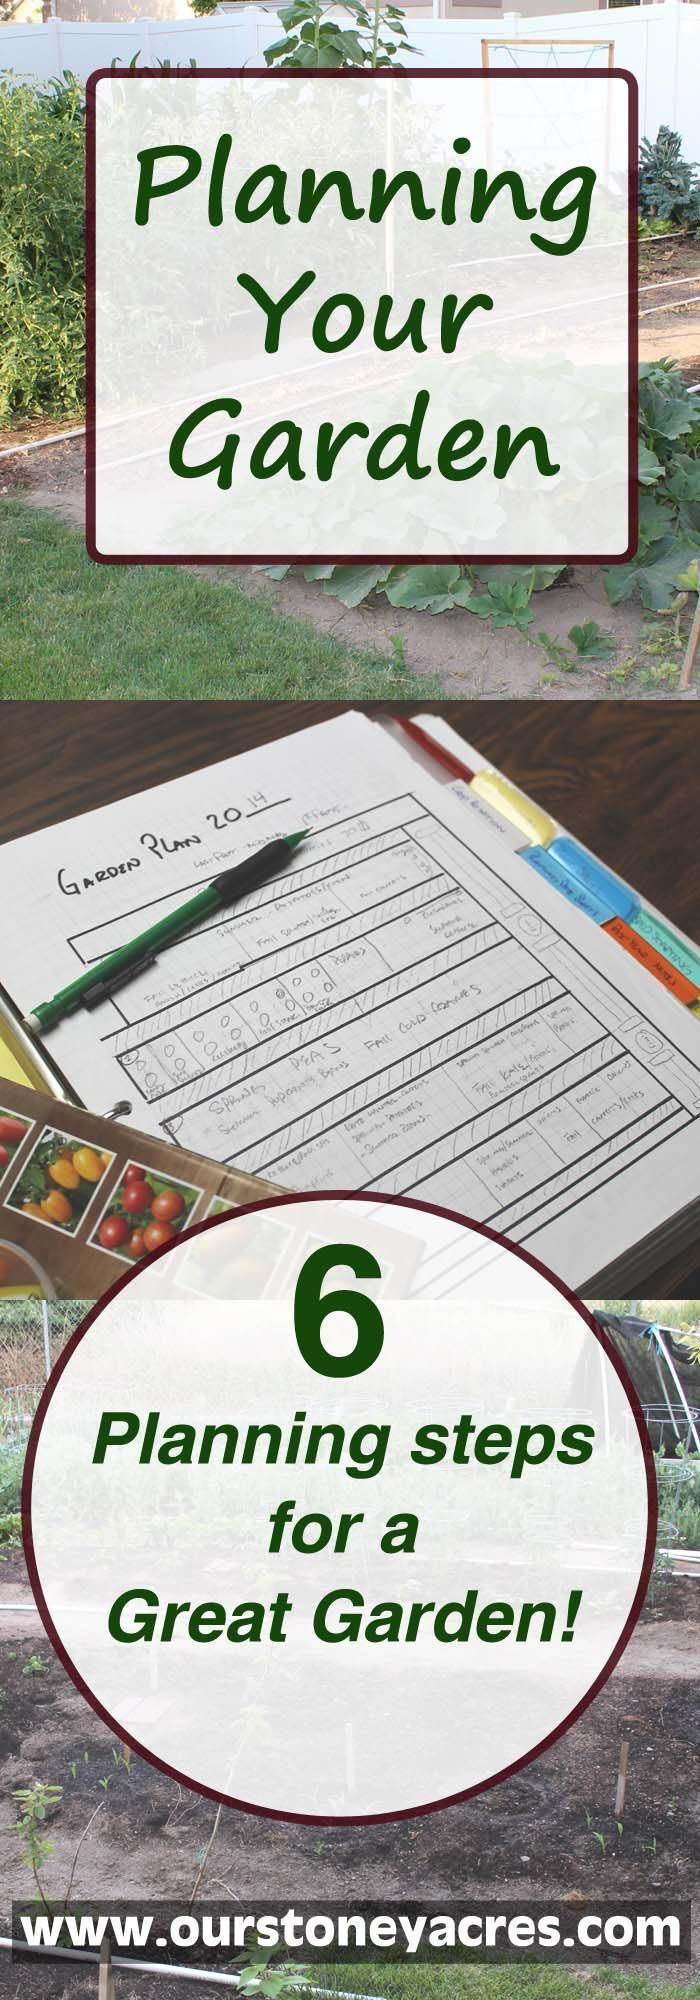 Planning Your Garden – 6 ideas for your best garden yet!